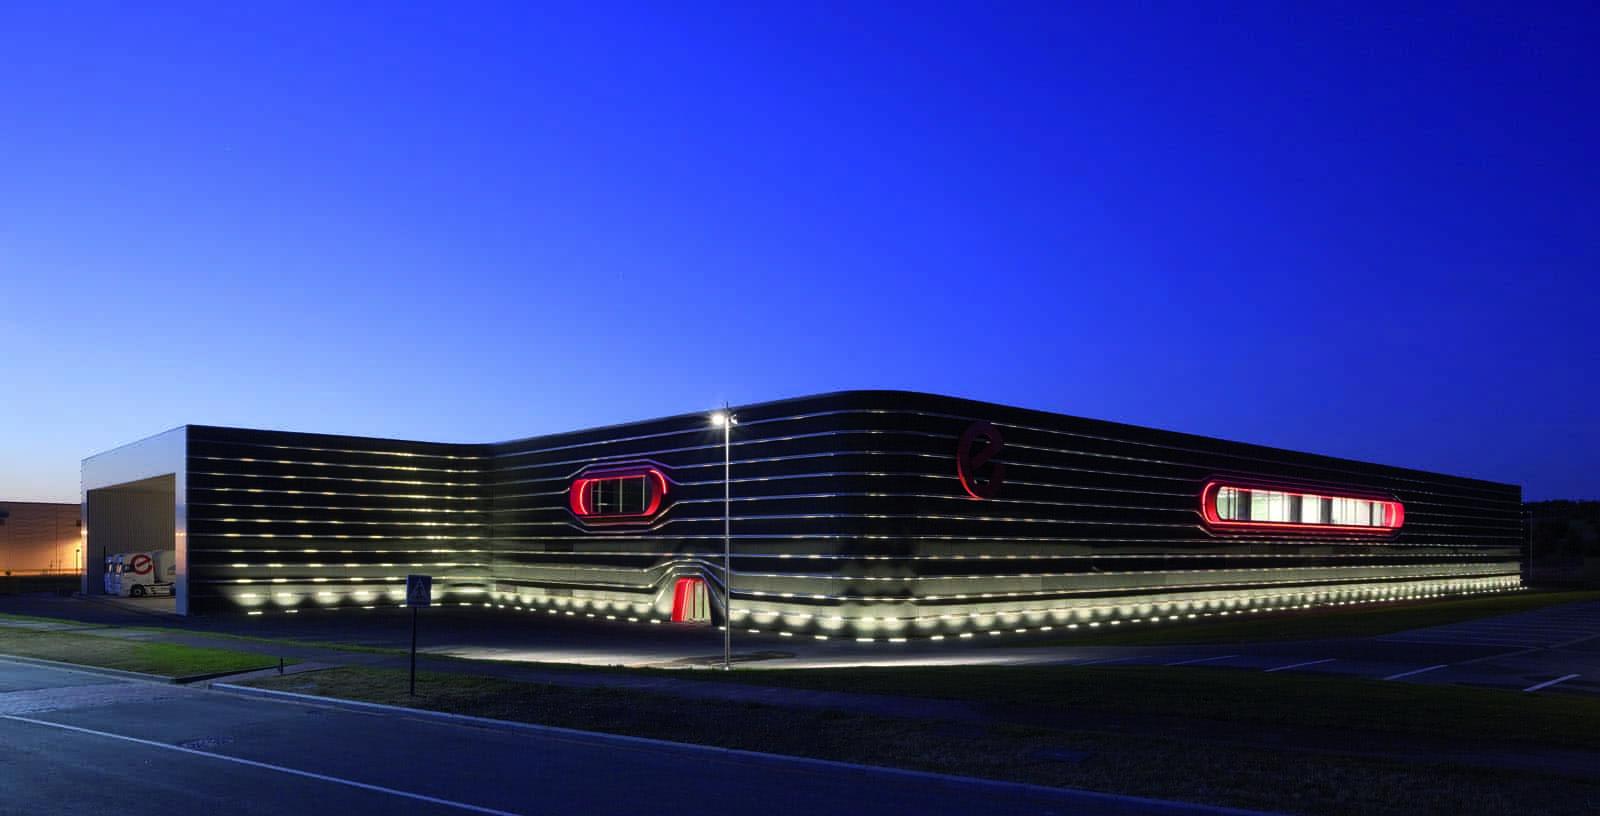 Epsilon_Euskadi_02_Architecture_Idom_photos_Aitor_Ortiz